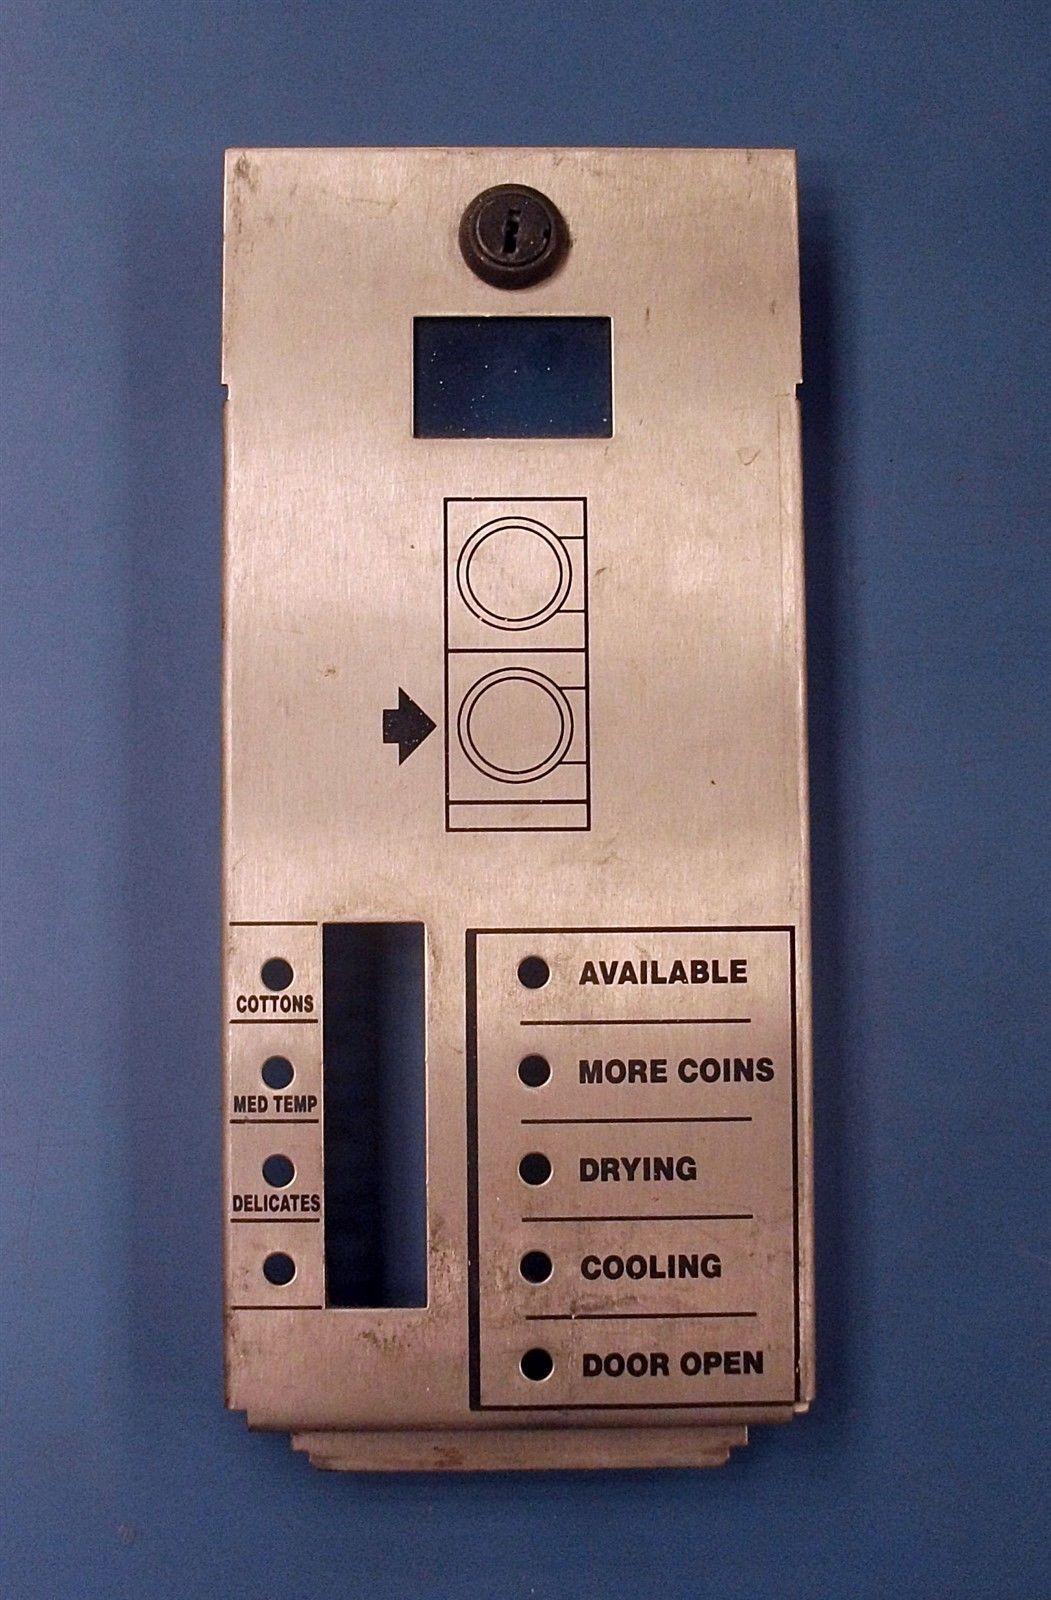 Huebsch Wascomat Speed Queen Lower Dryer Control Faceplate Model jtd32dg